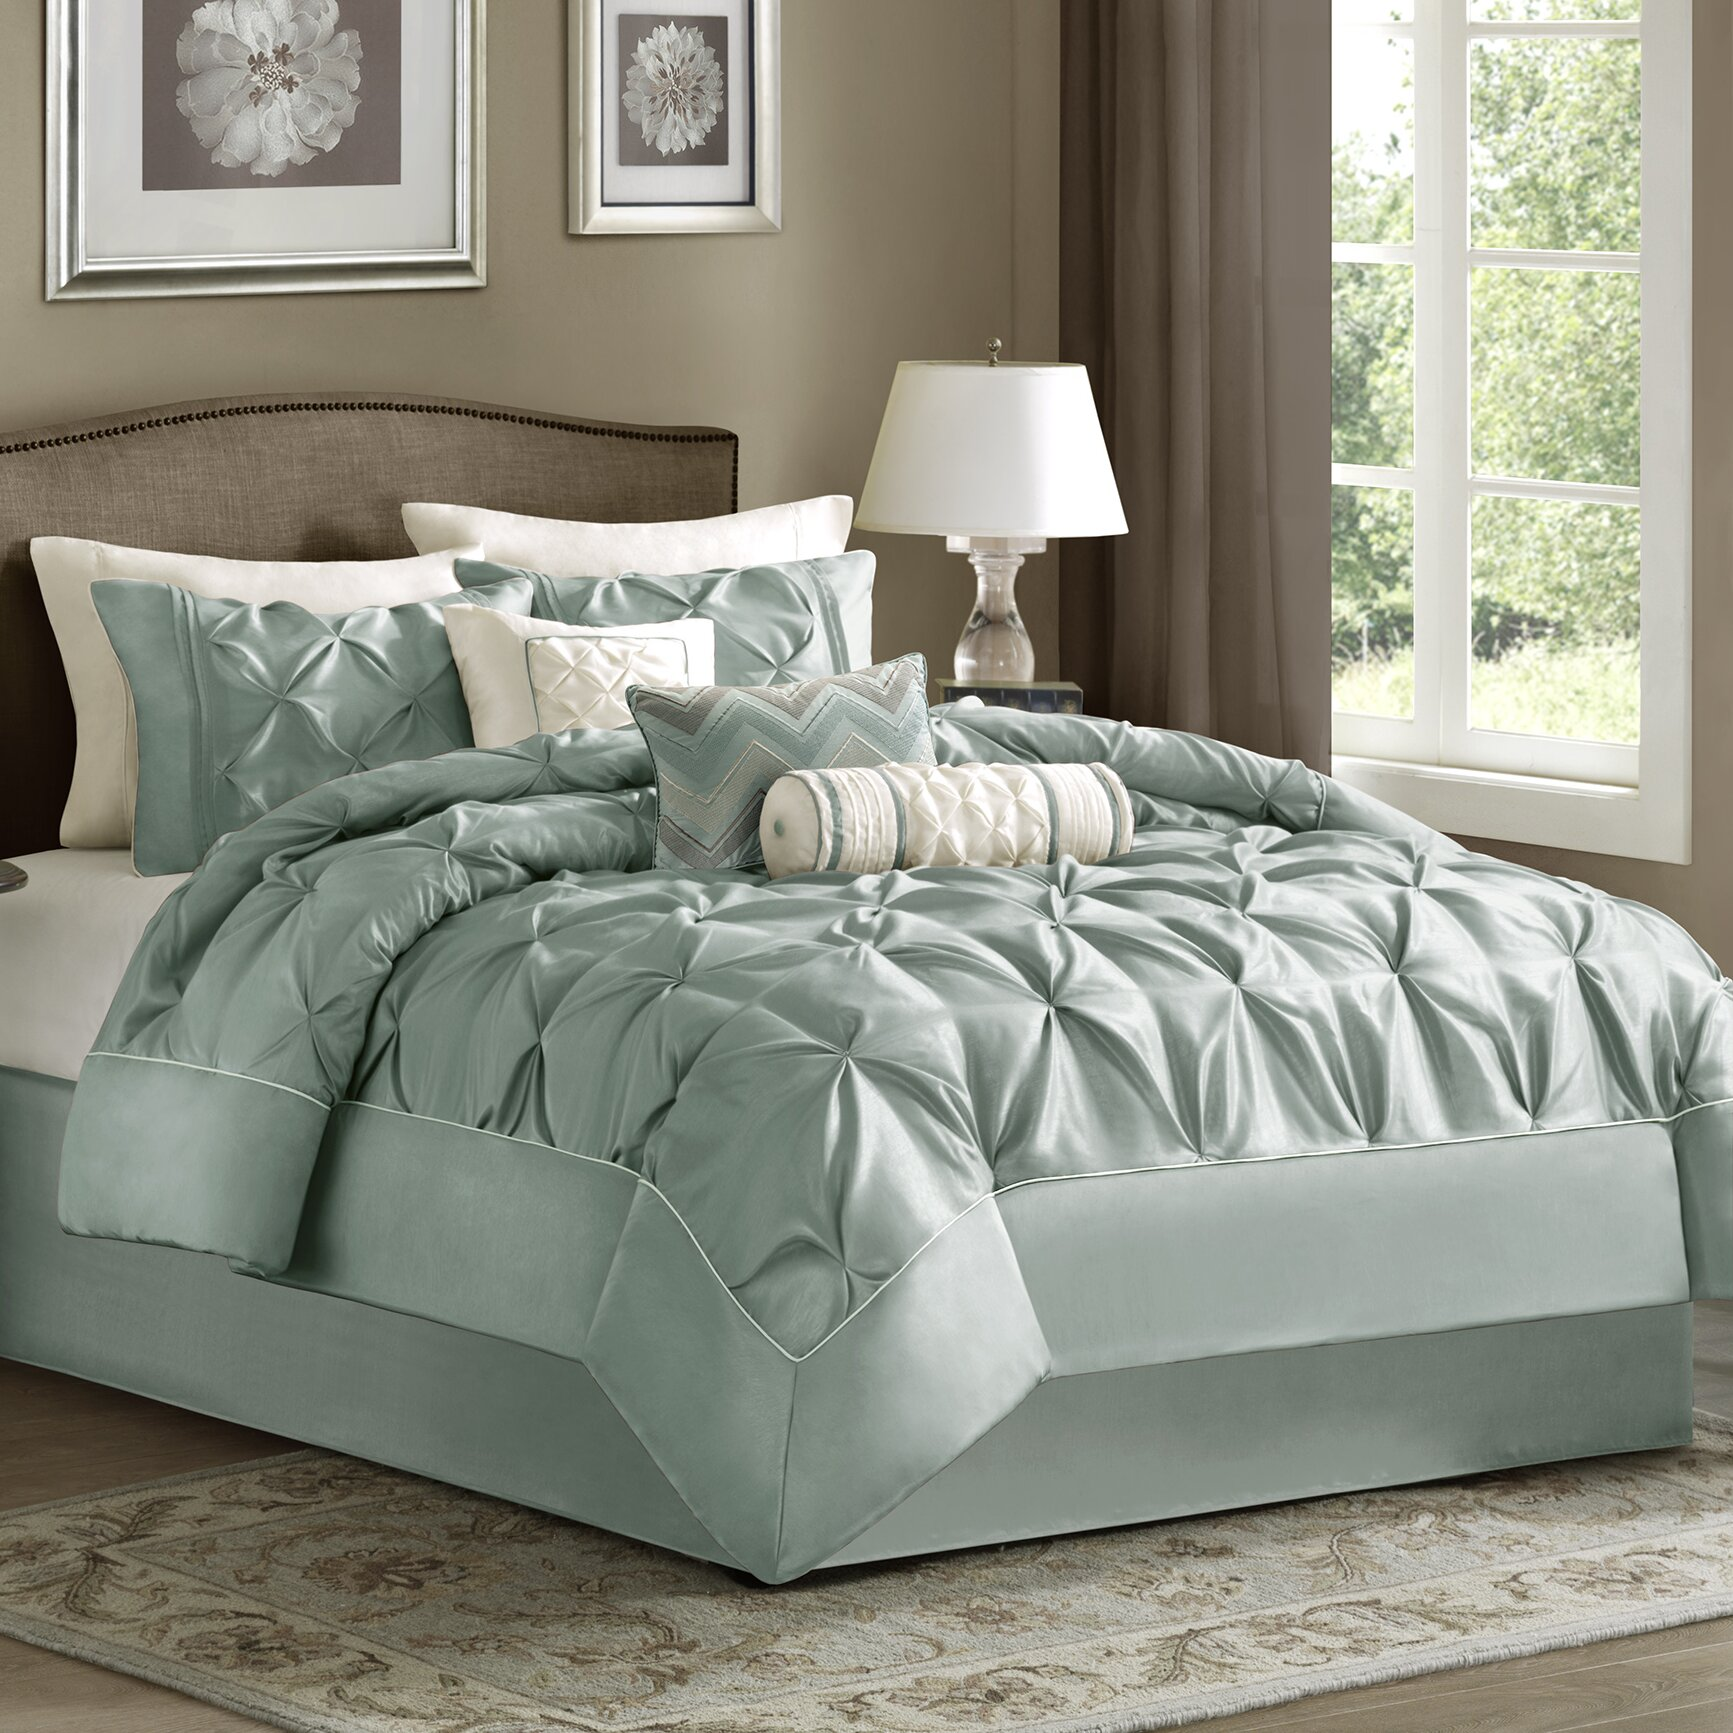 Bedding Sets Youll LoveWayfair